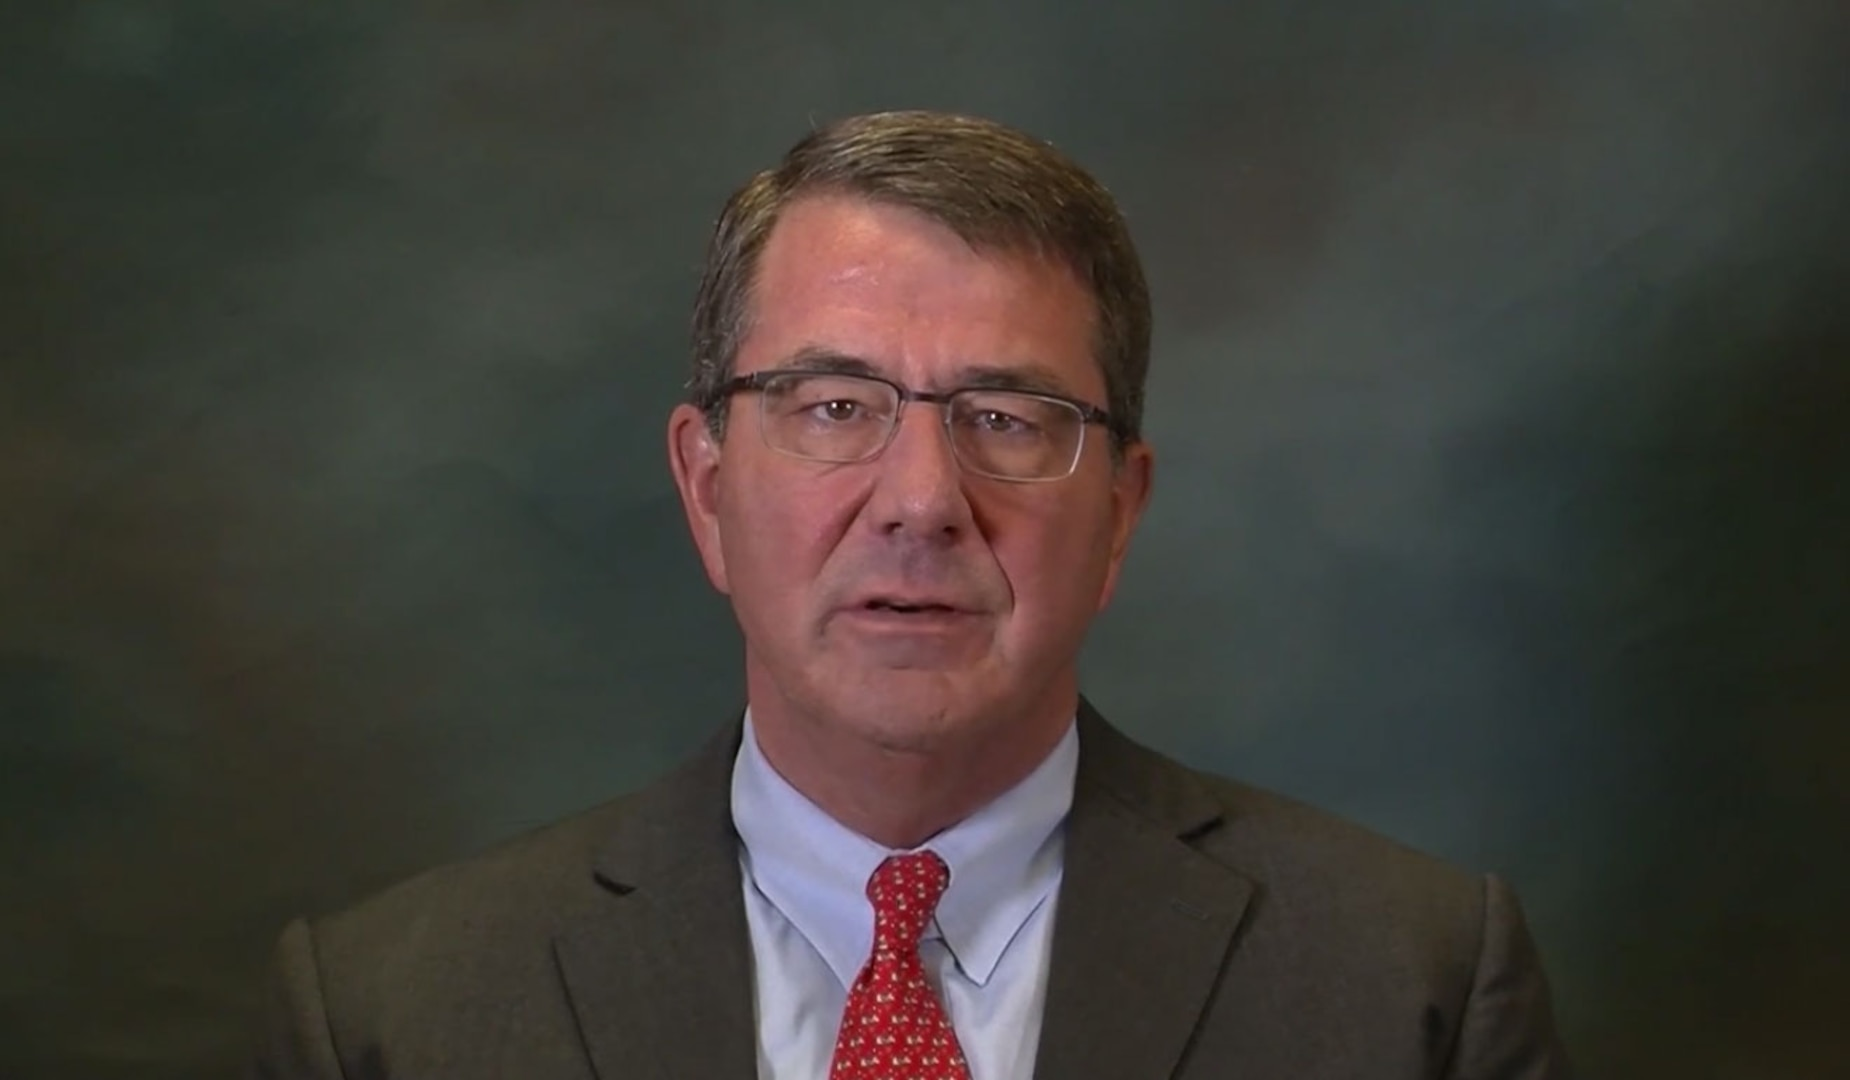 Dr. Ashton B. Carter, Remarks delivered at National Defense University on May 14, 2014